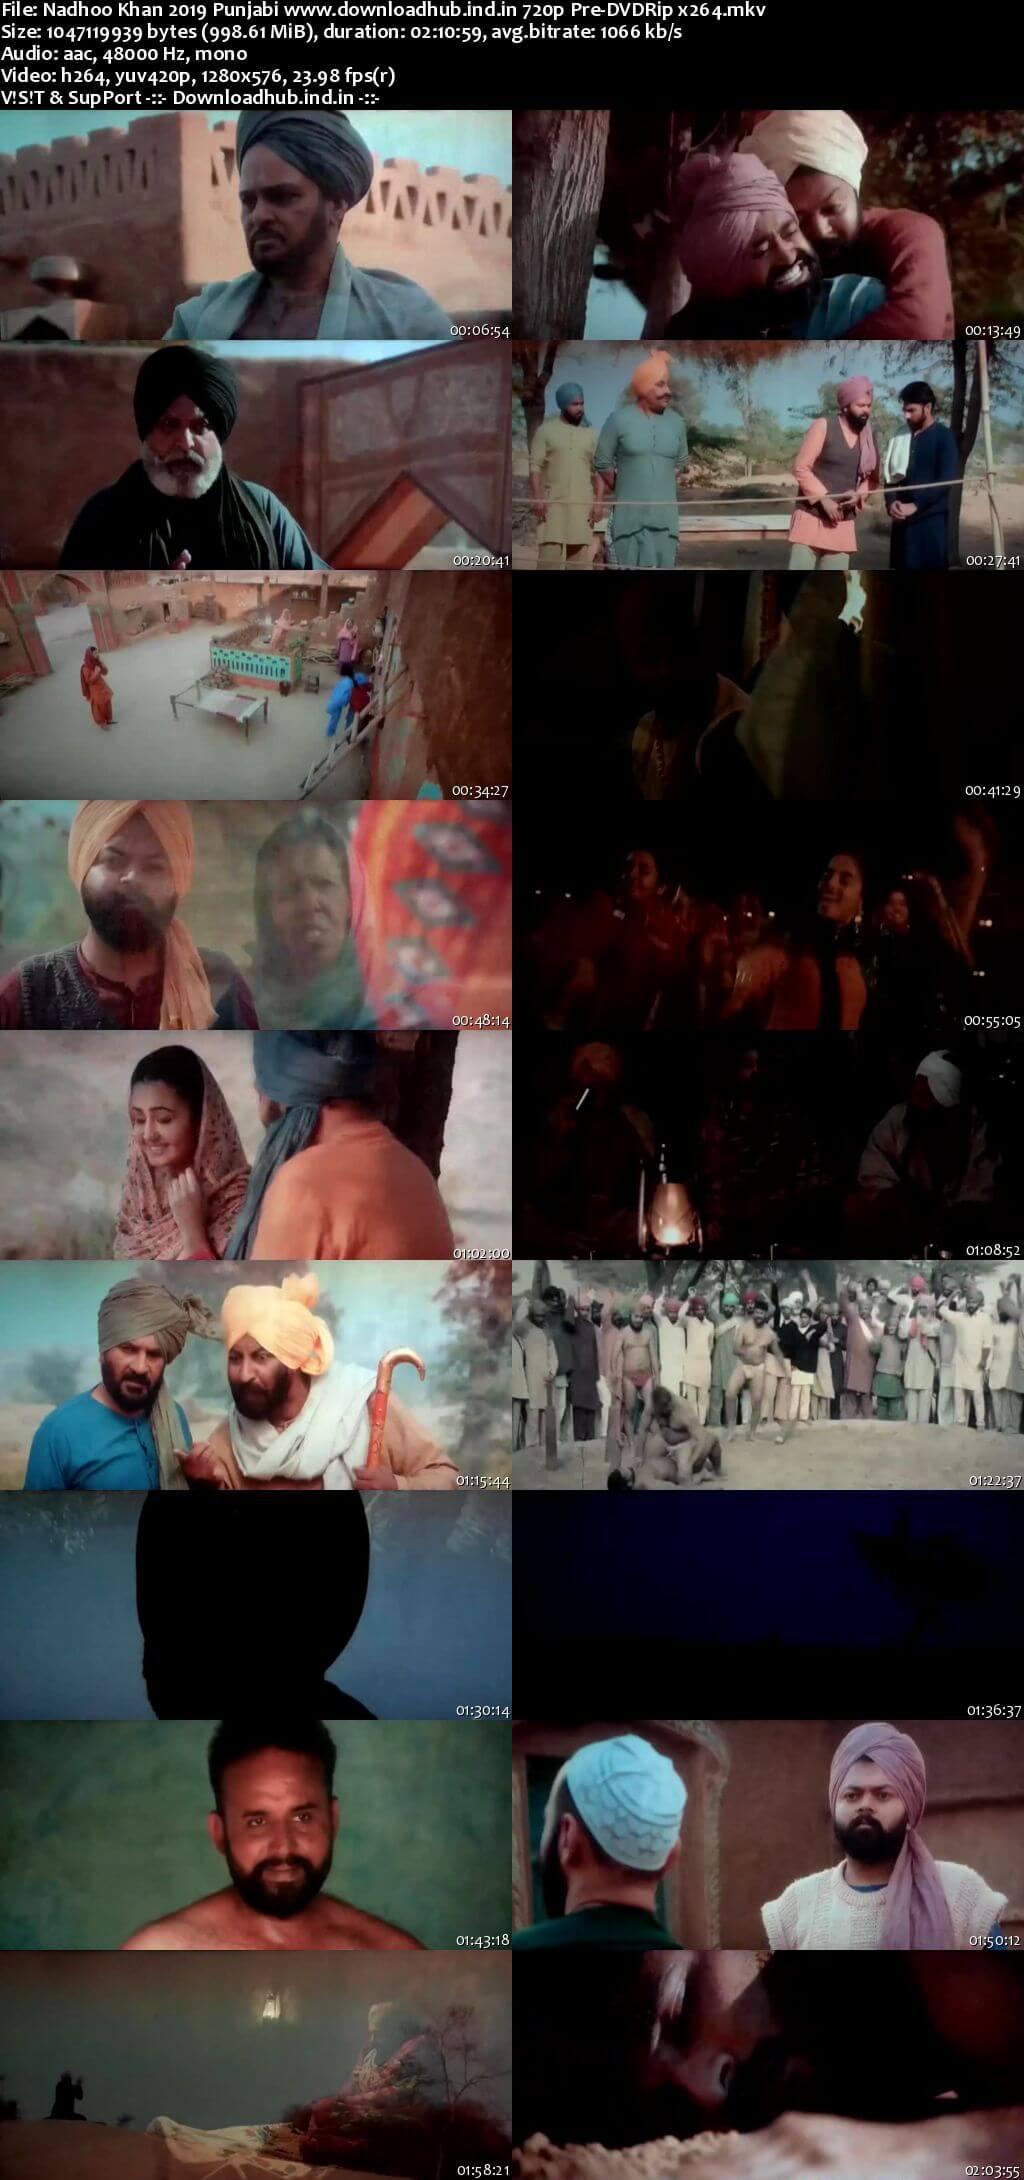 Nadhoo Khan 2019 Punjabi 720p Pre-DVDRip x264